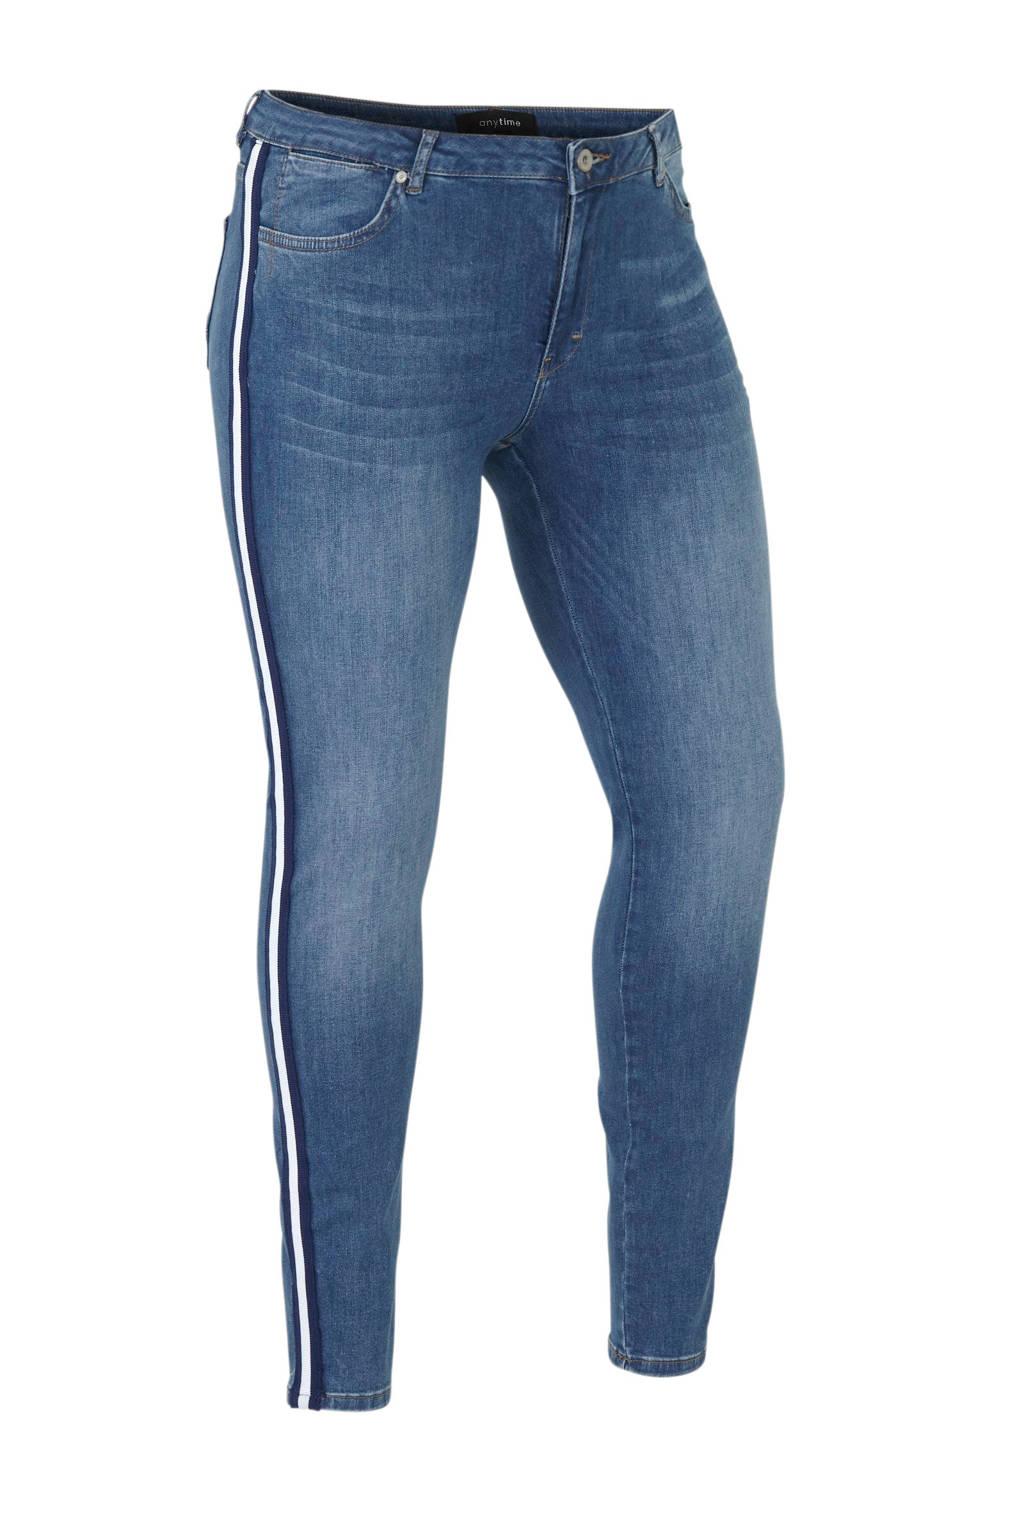 anytime super comfort basic skinny Plus size jeans met zijnaadbies, Stonewashed blauw